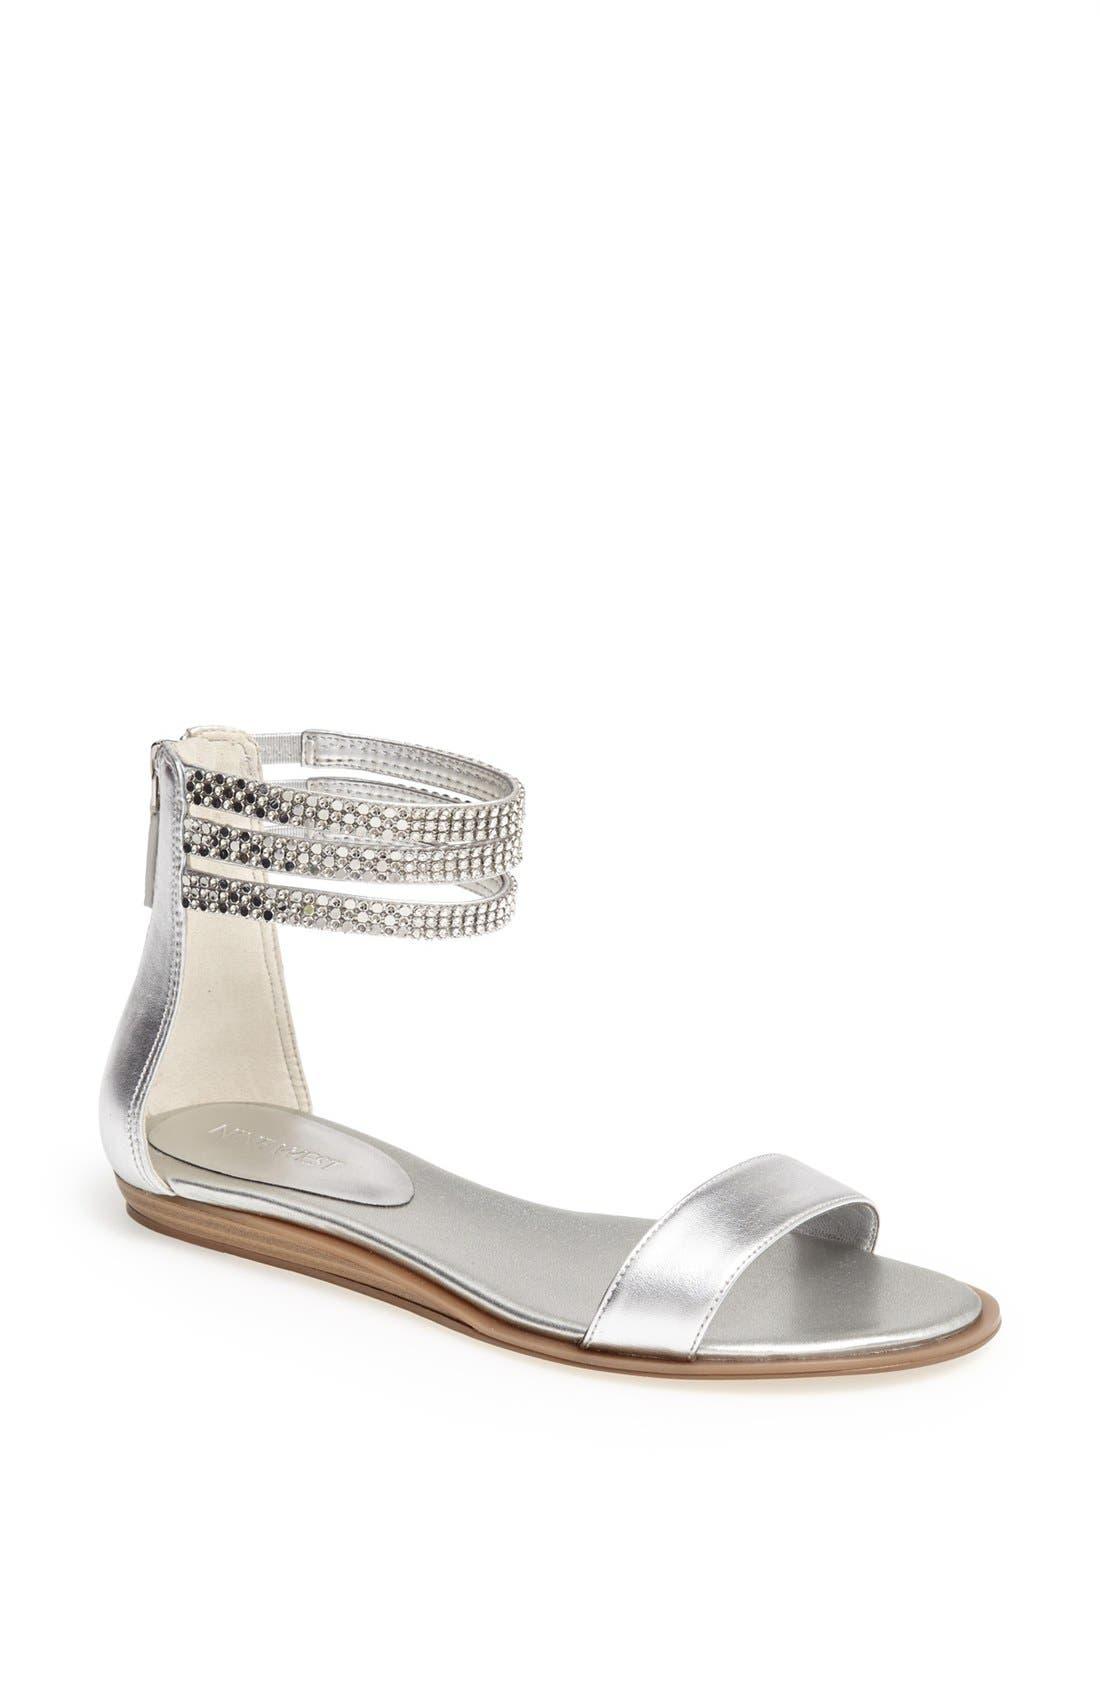 Main Image - Nine West 'Viemette' Sandal